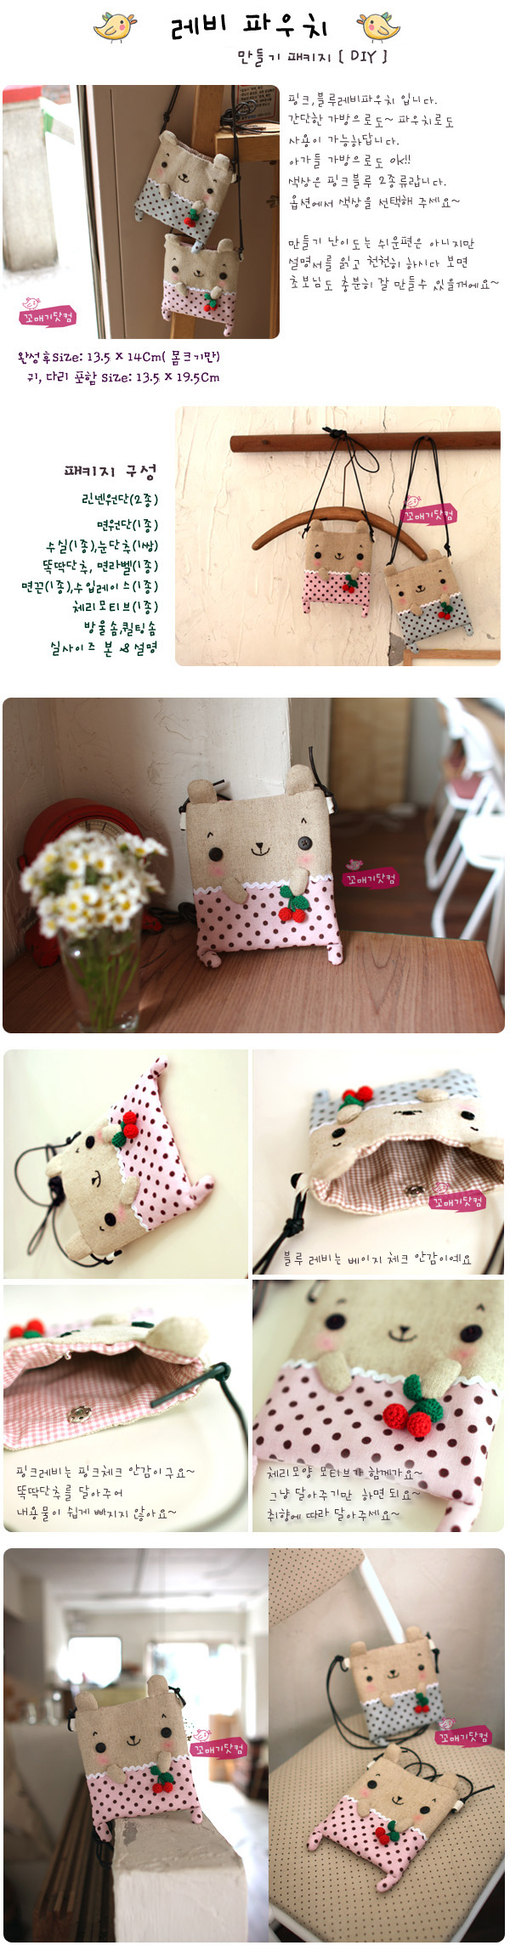 DIY a cute purse